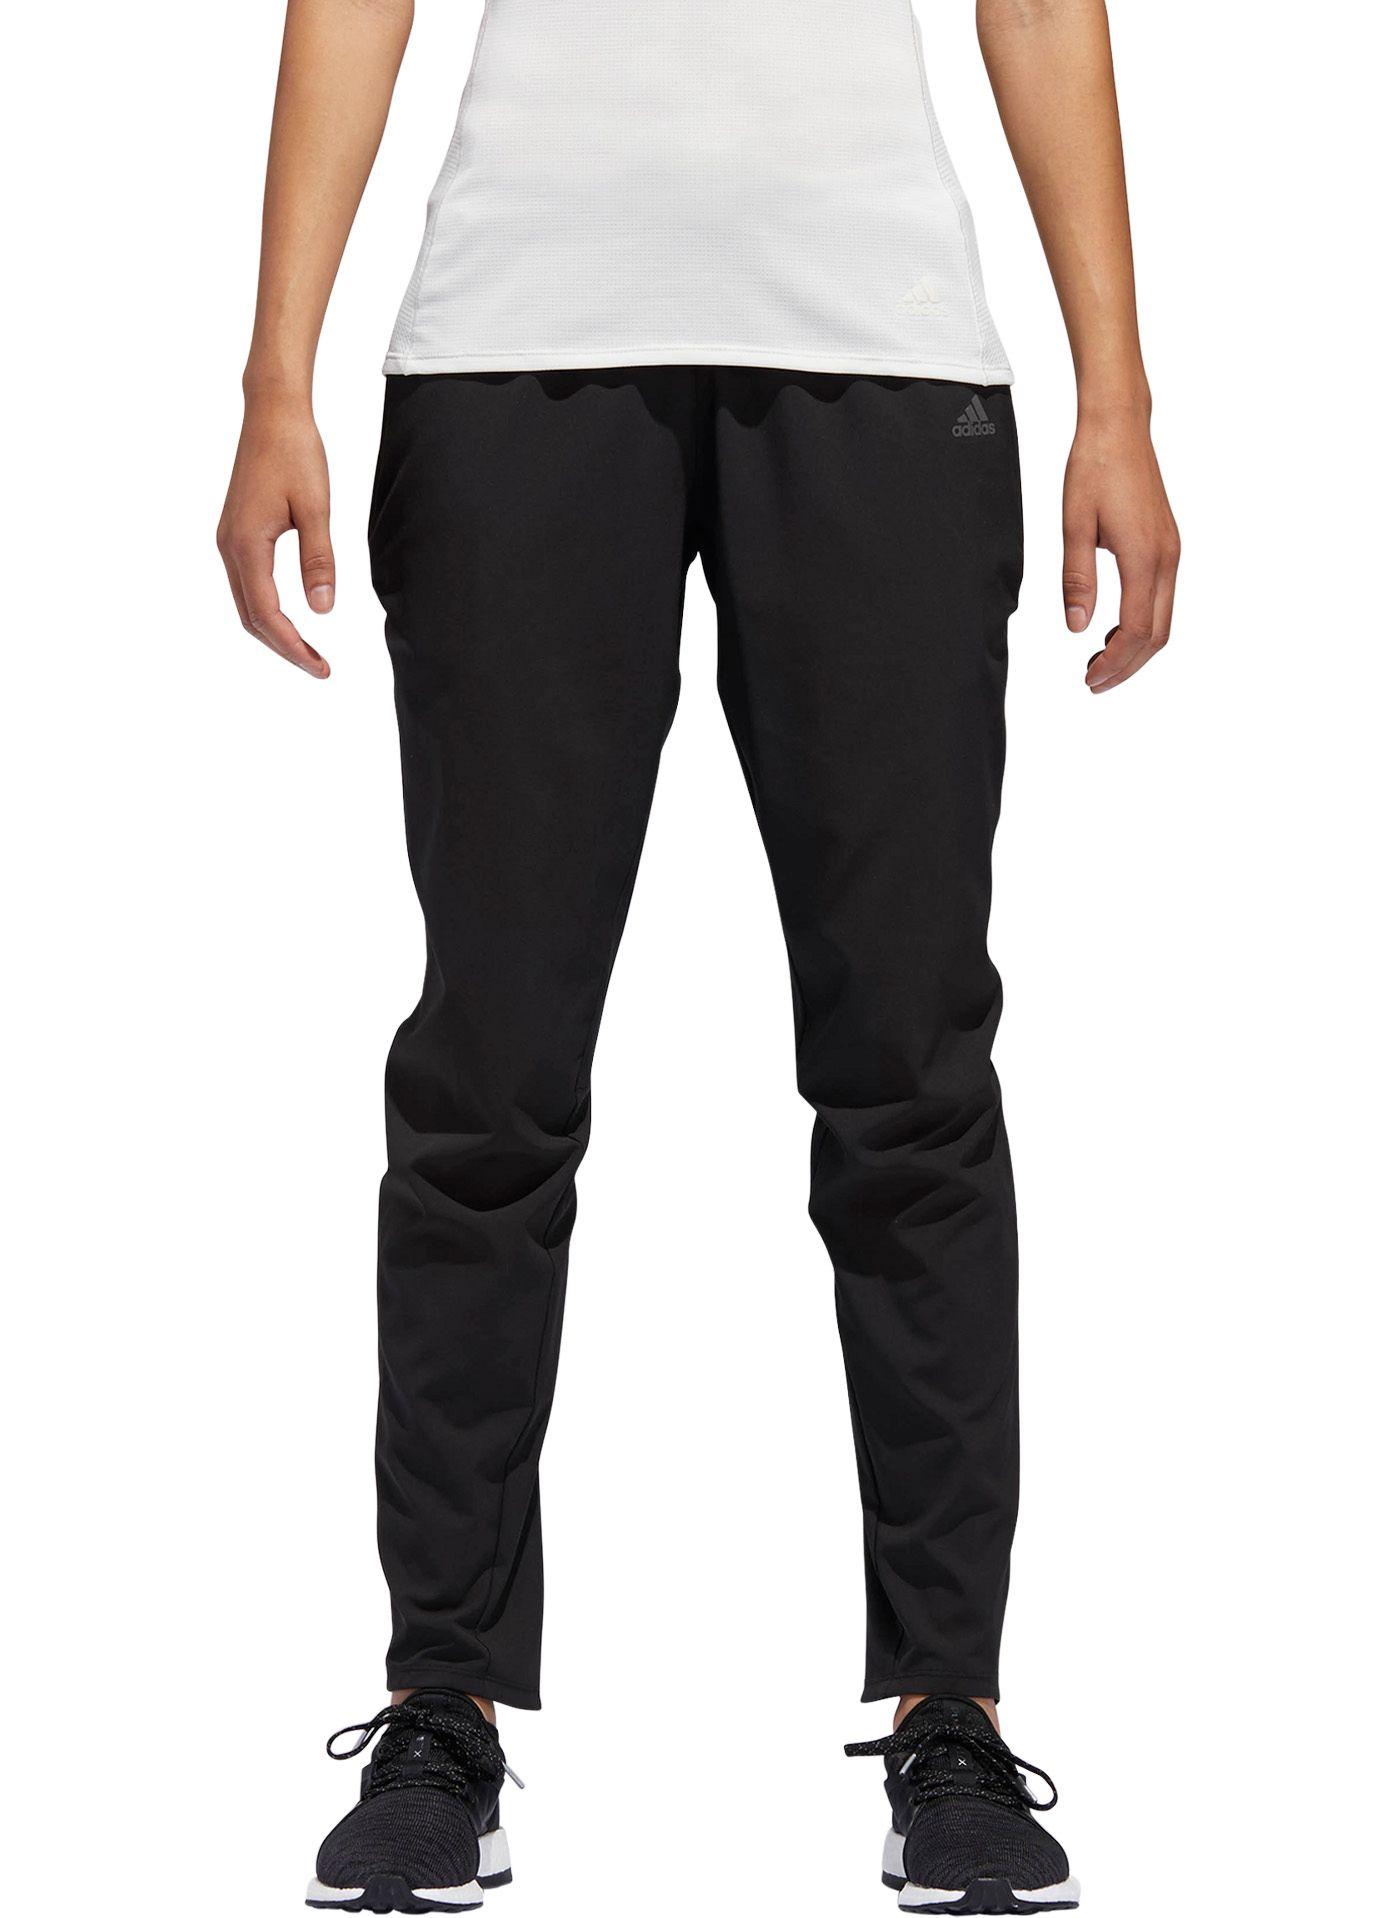 adidas Women's Supernova Running Pants